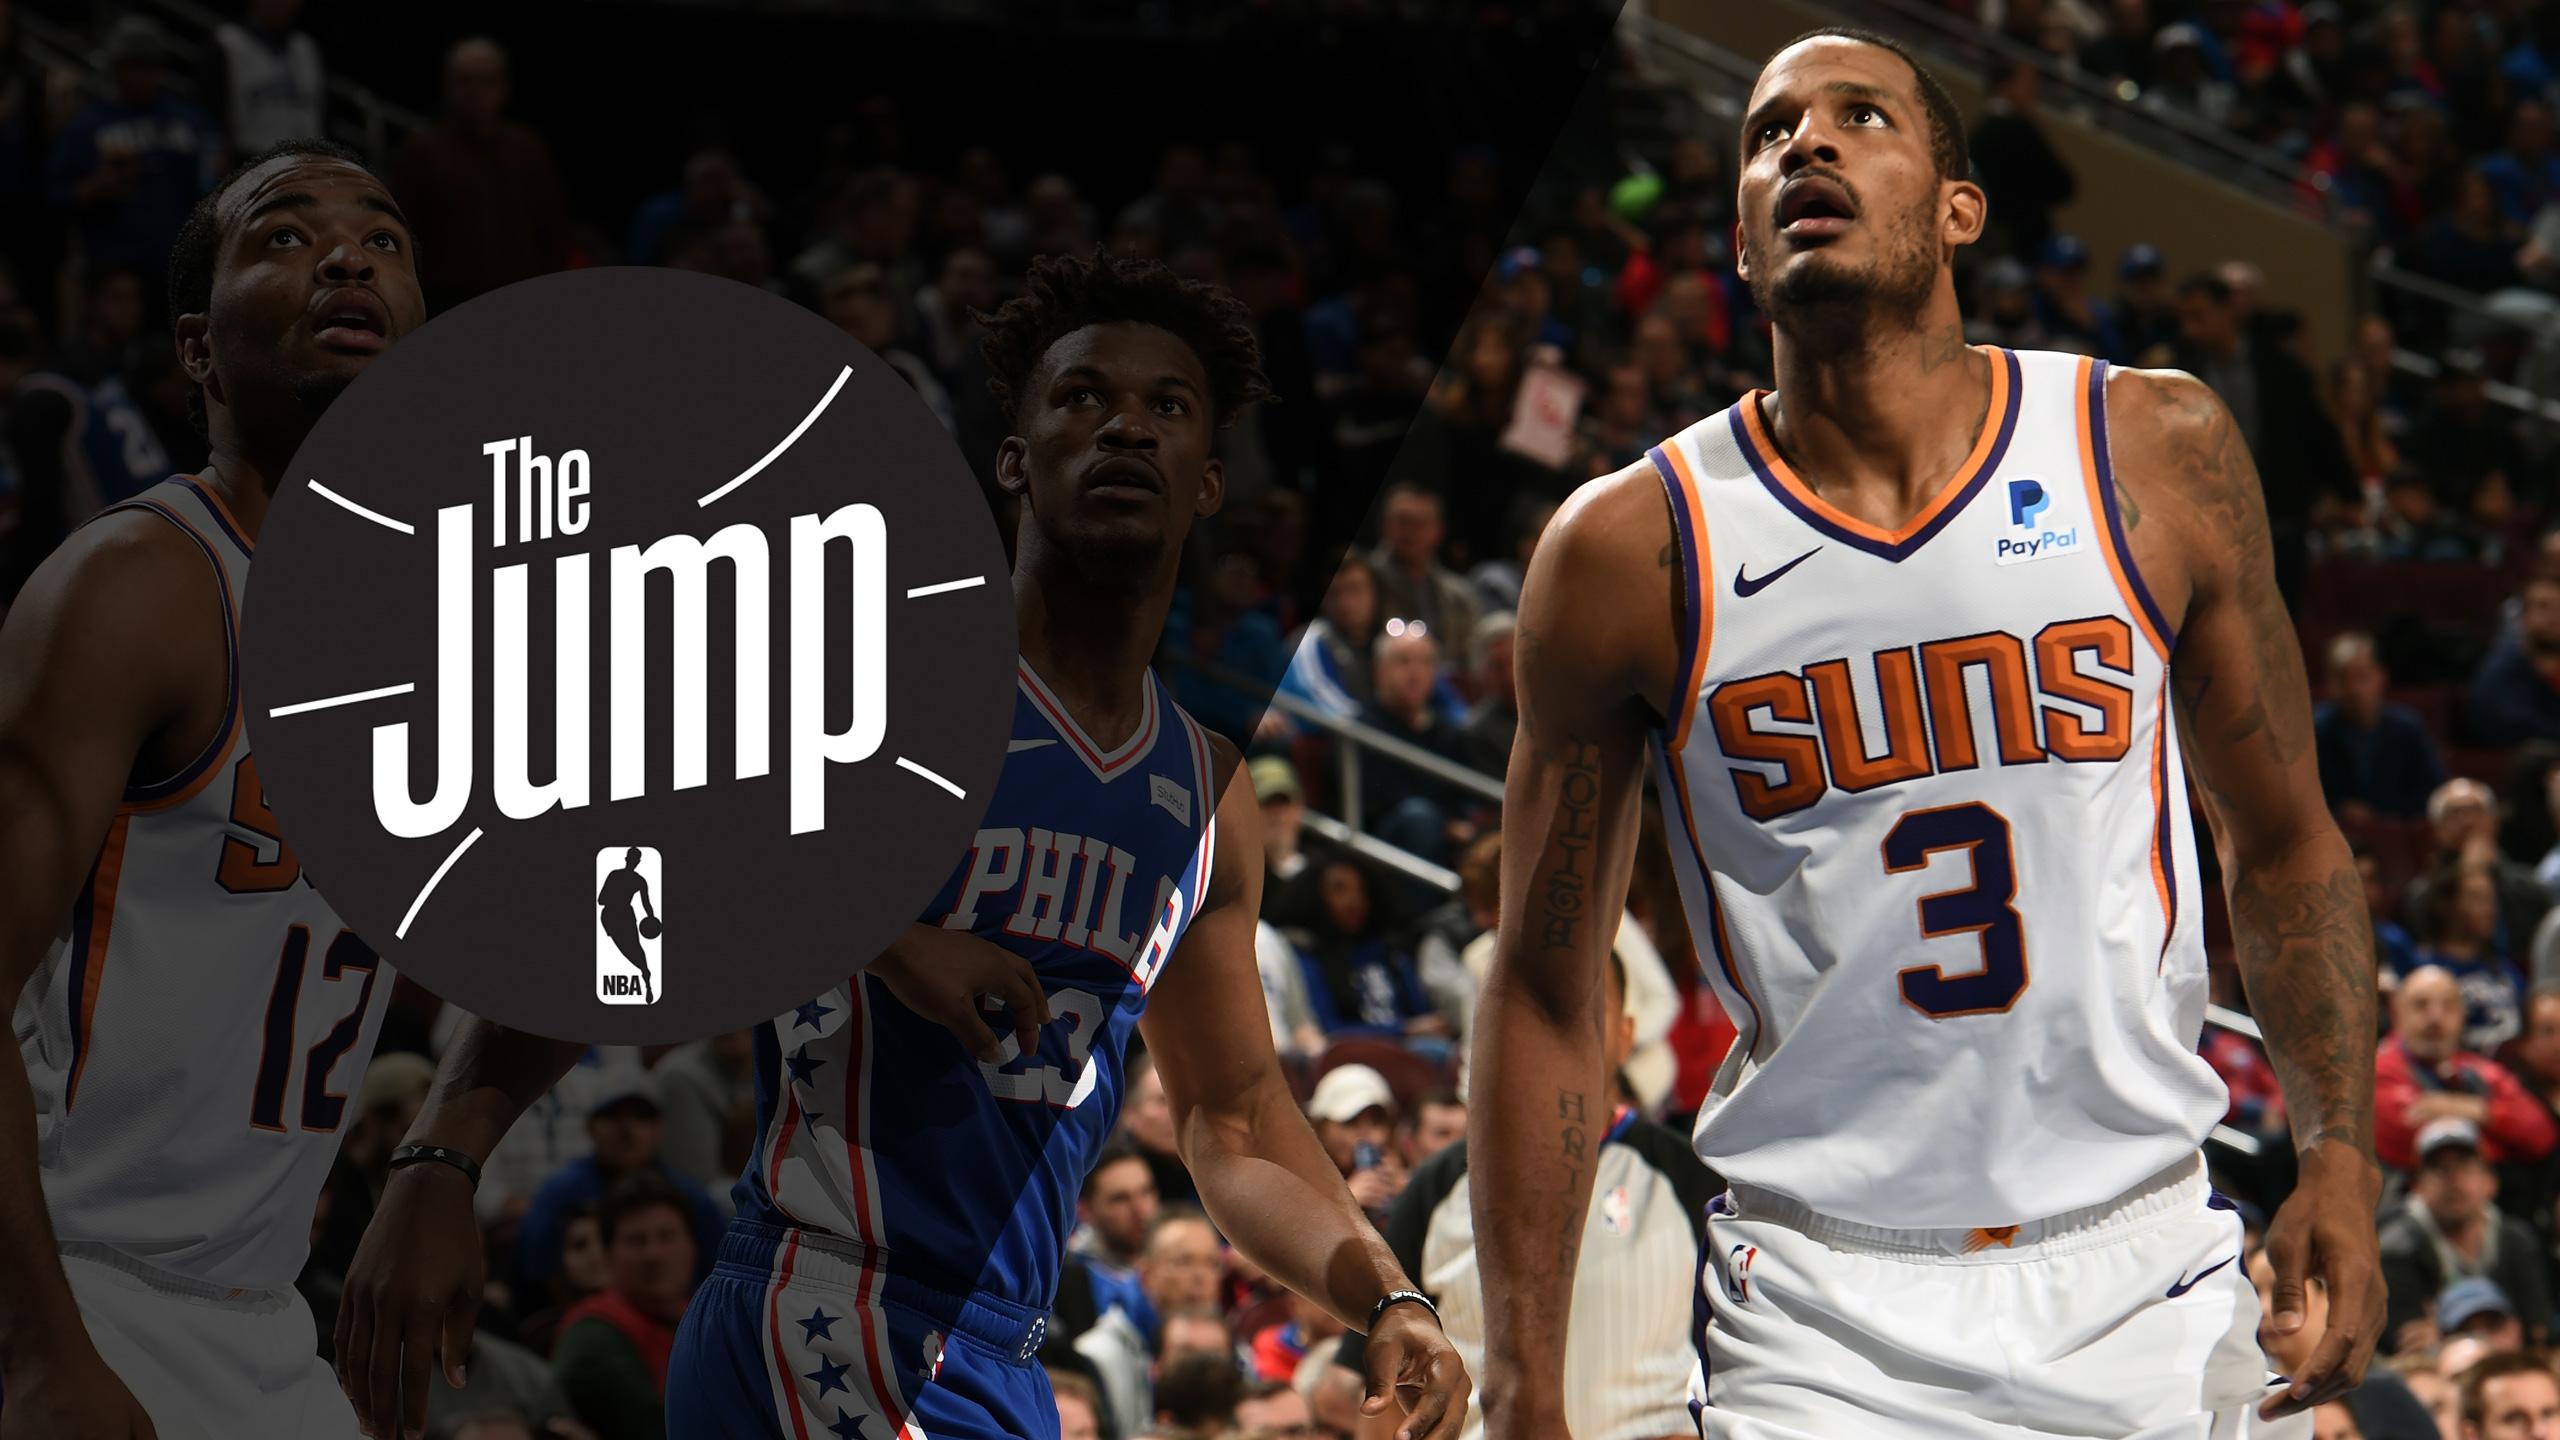 Mon, 12/17 - NBA: The Jump